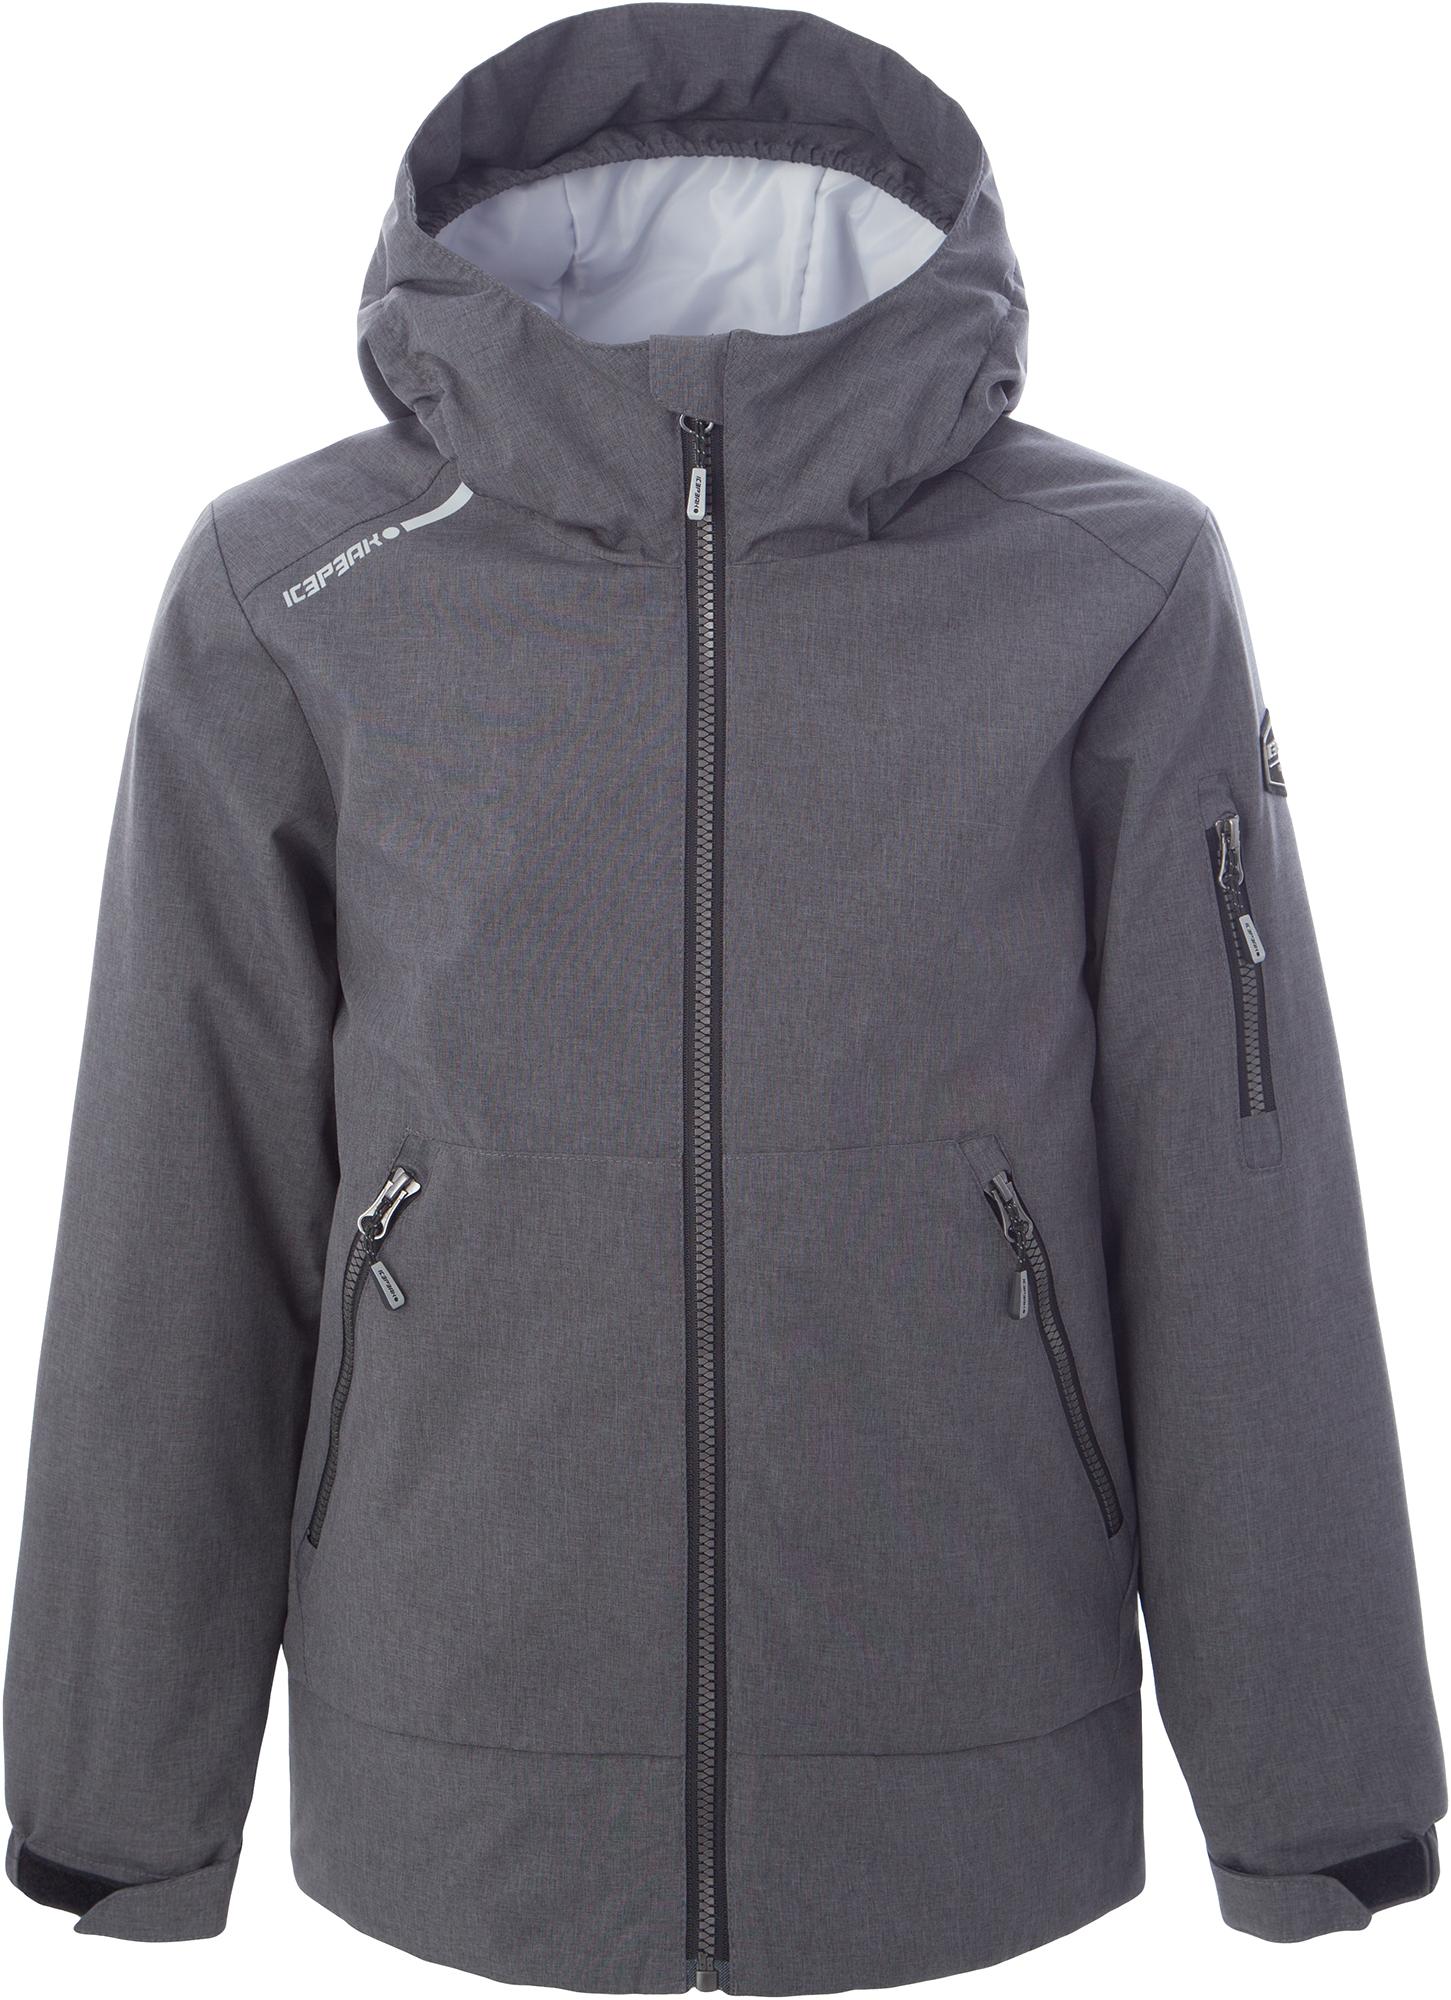 IcePeak Куртка утепленная для мальчиков IcePeak Tide, размер 164